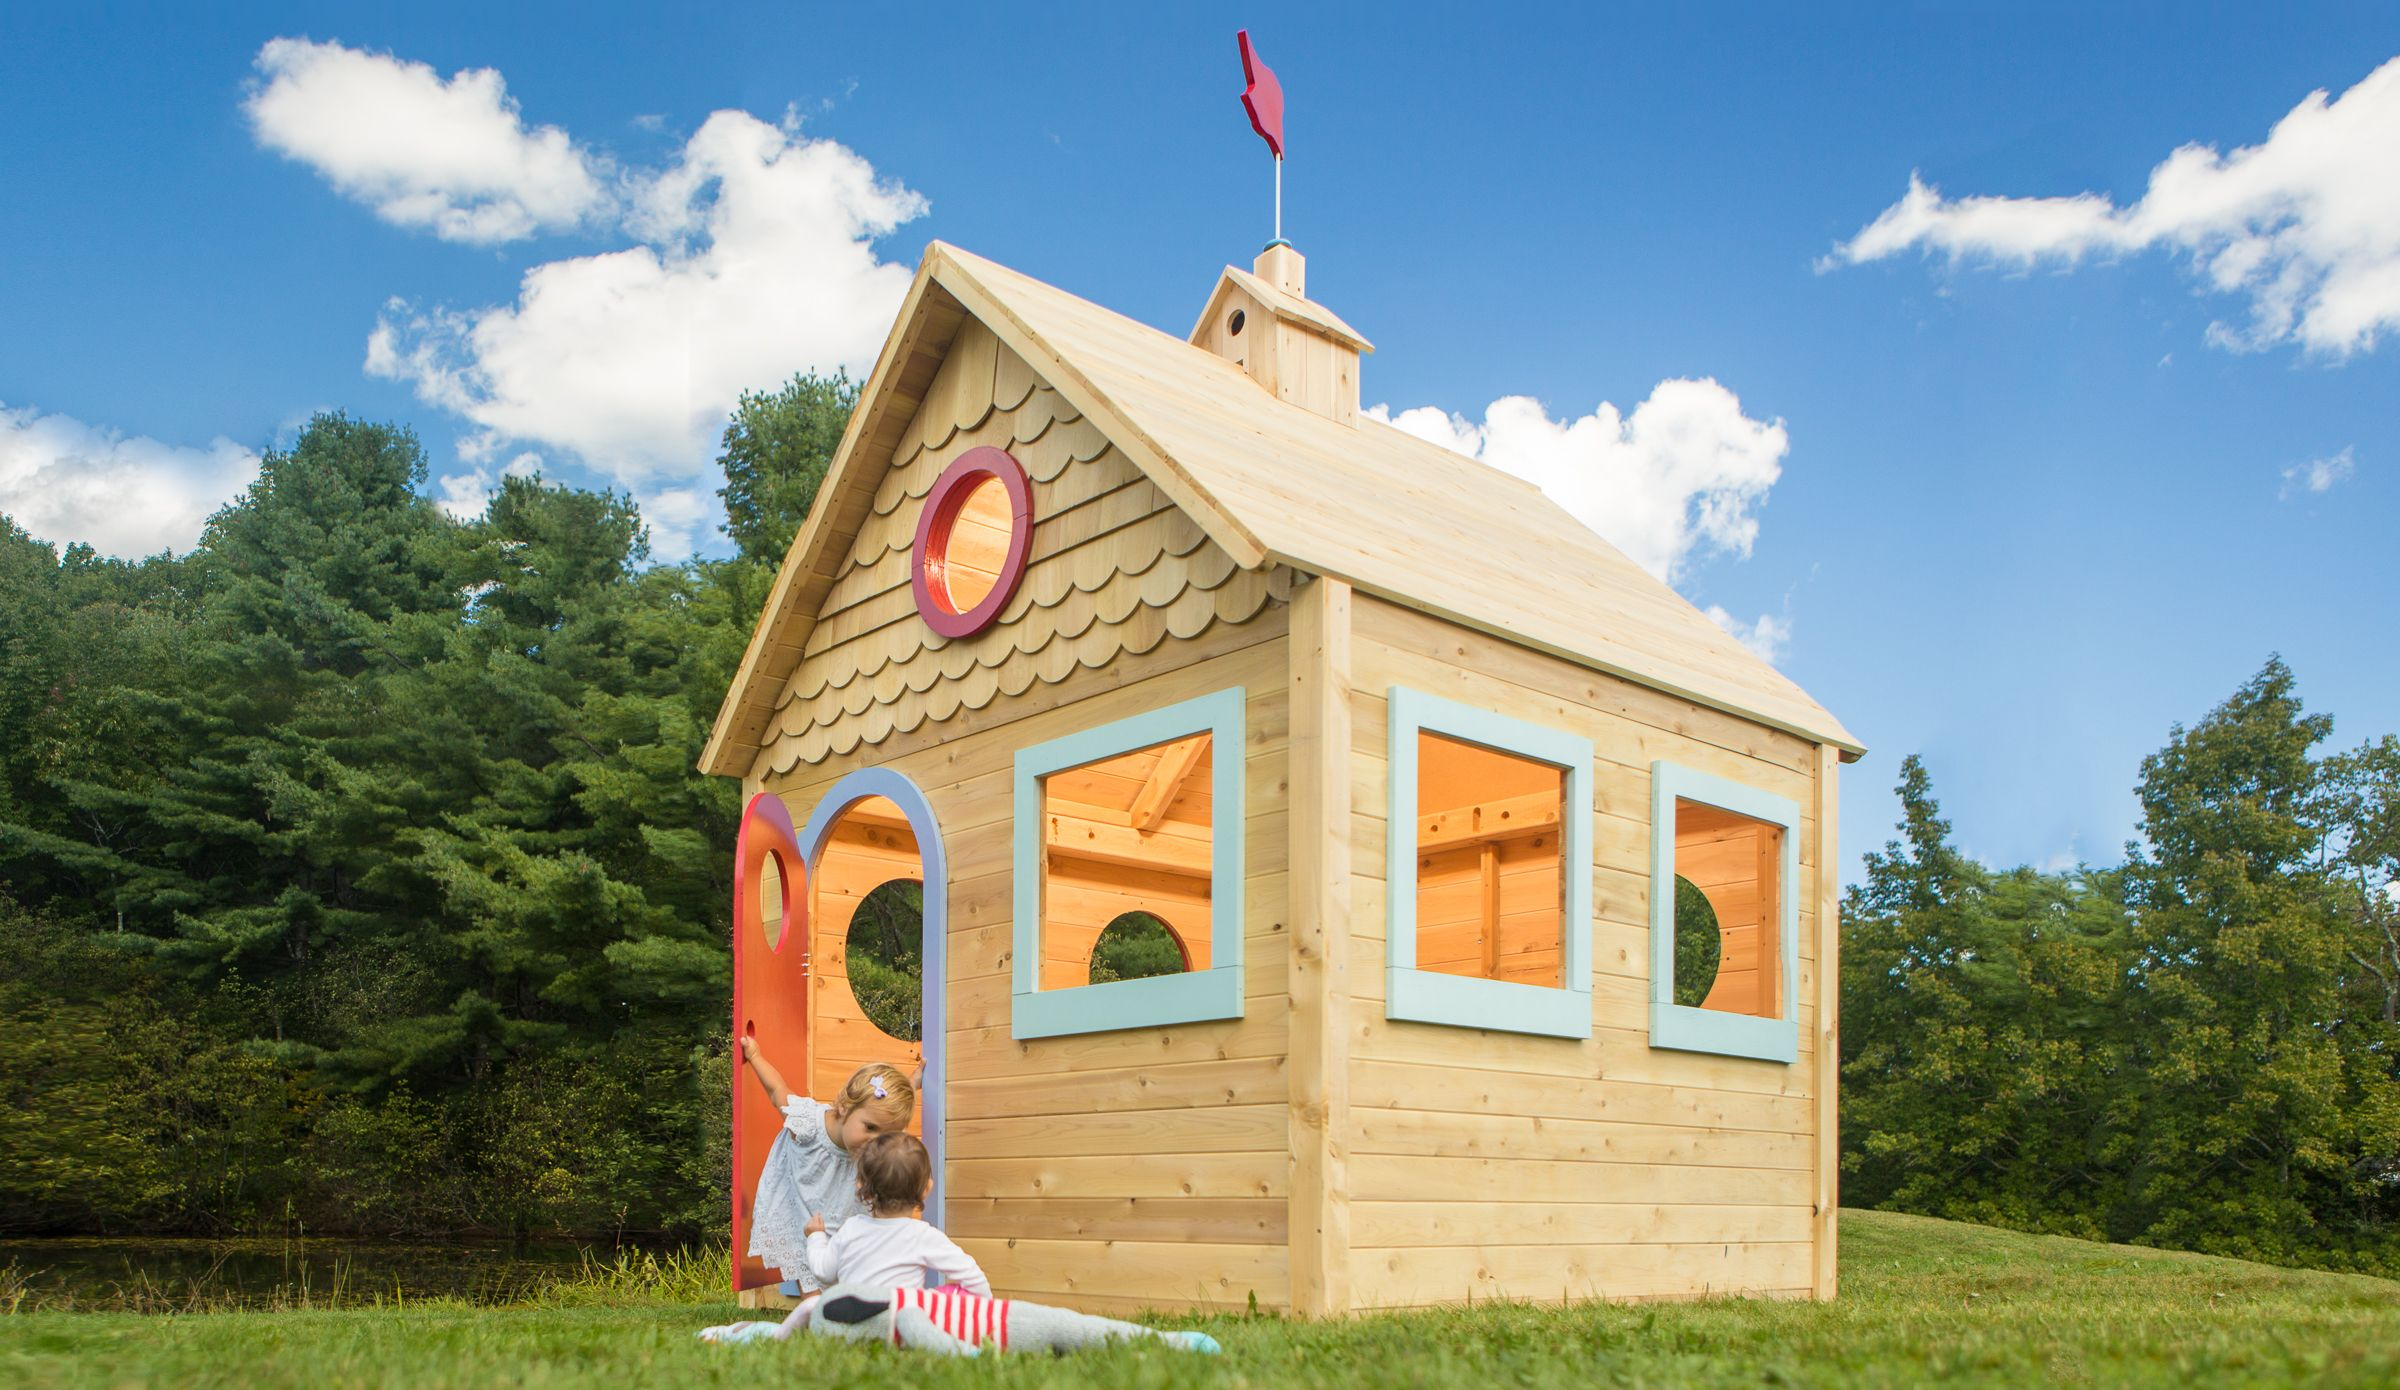 cedarworks playhouse 870 whimsical design details make us believe